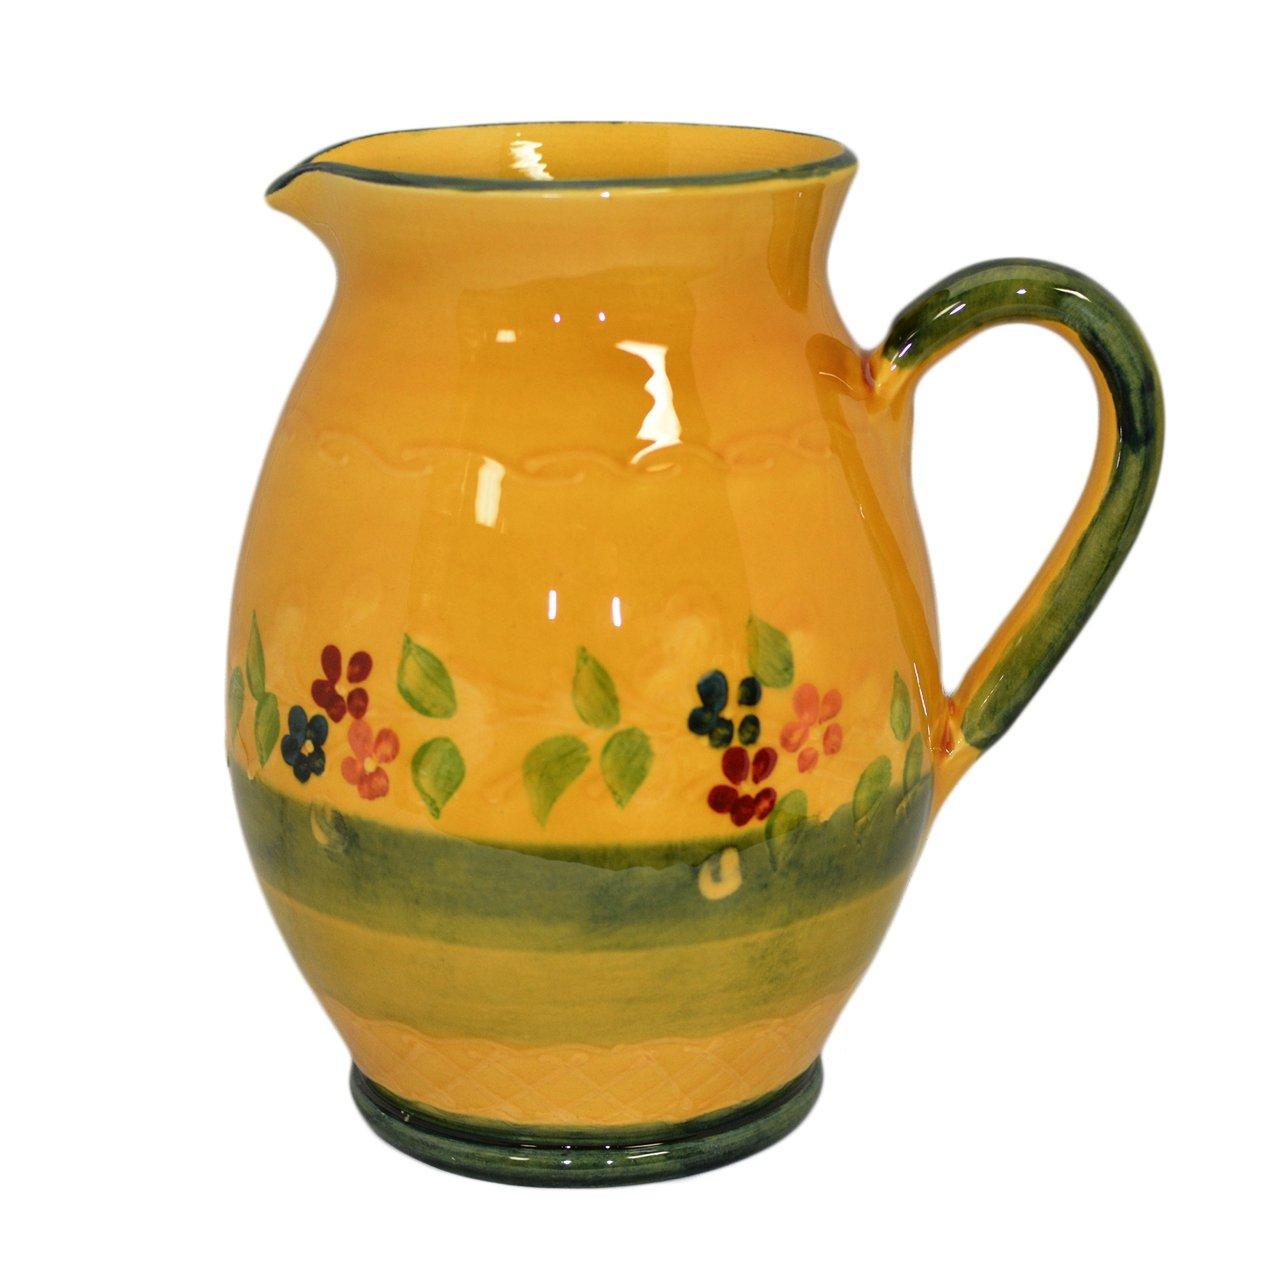 Souleo Provence Terre e Provence Pottery - Round Water Jug